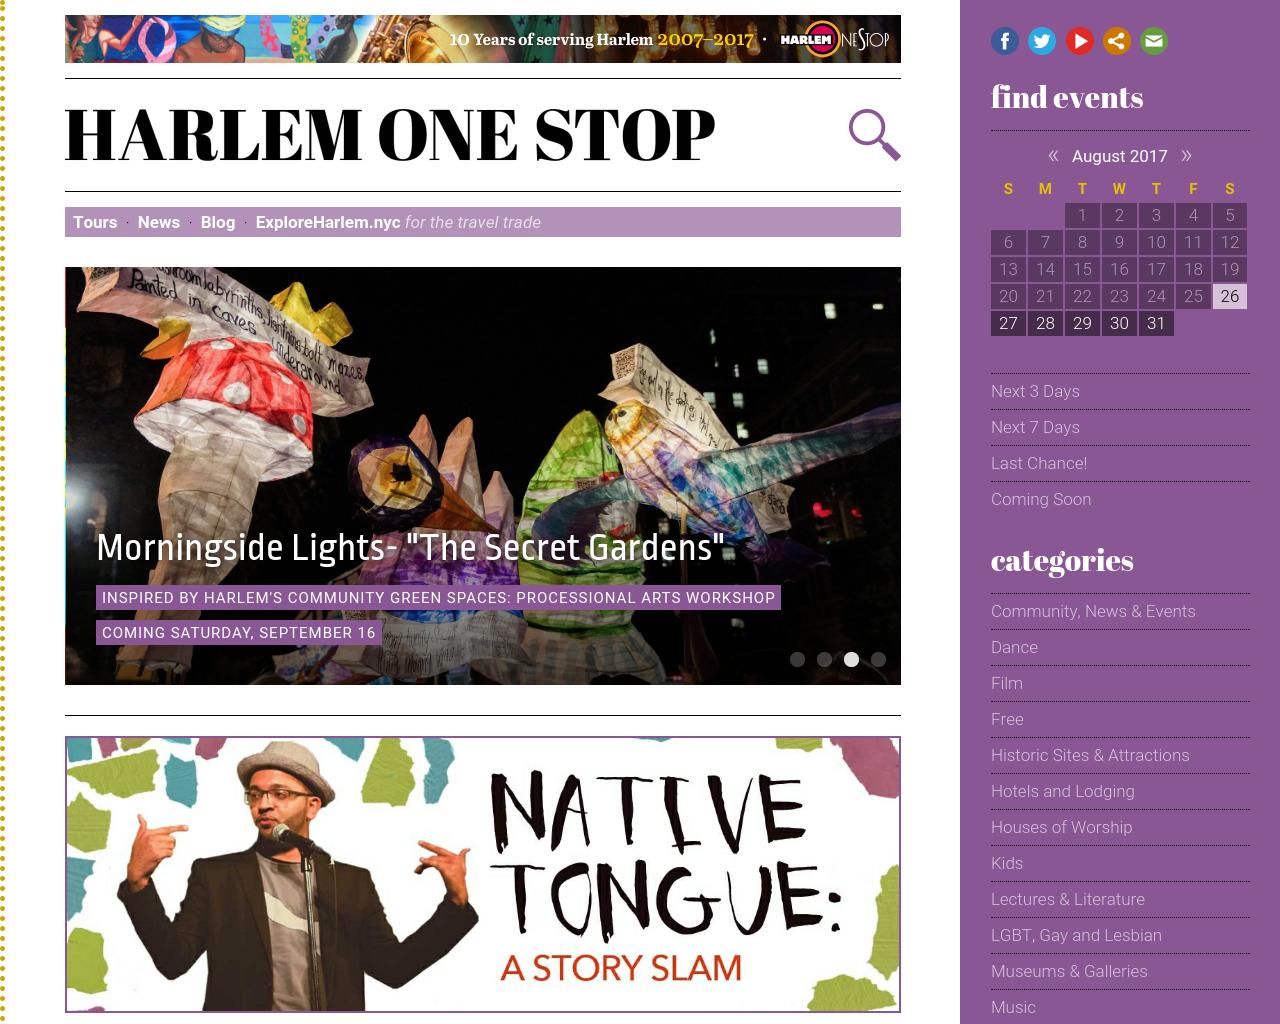 Harlem-One-Stop-Advertising-Reviews-Pricing